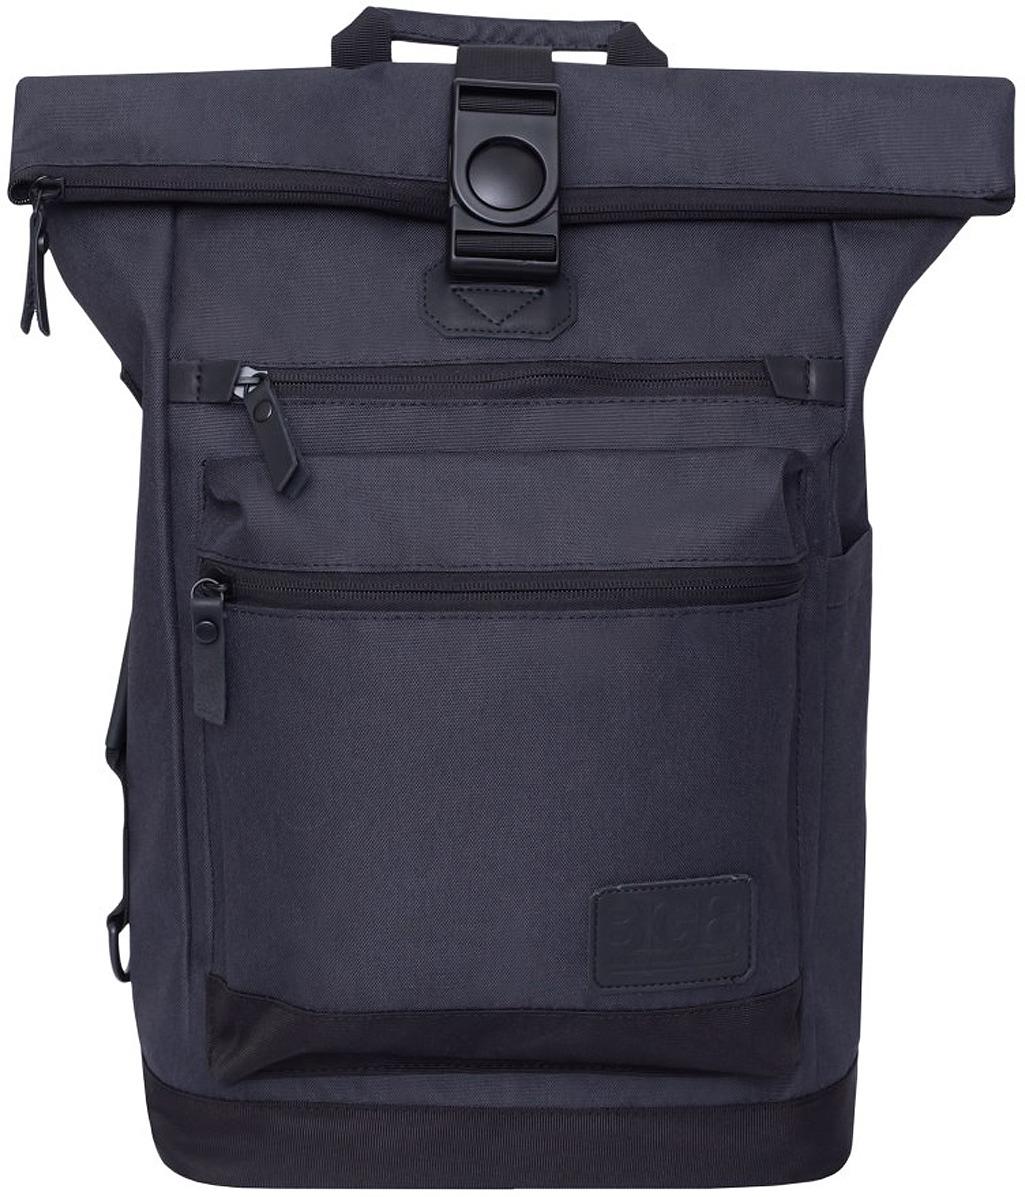 Рюкзак городской Grizzly, RQ-912-1/1, черный, 10 л рюкзак grizzly rq 912 1 1 black